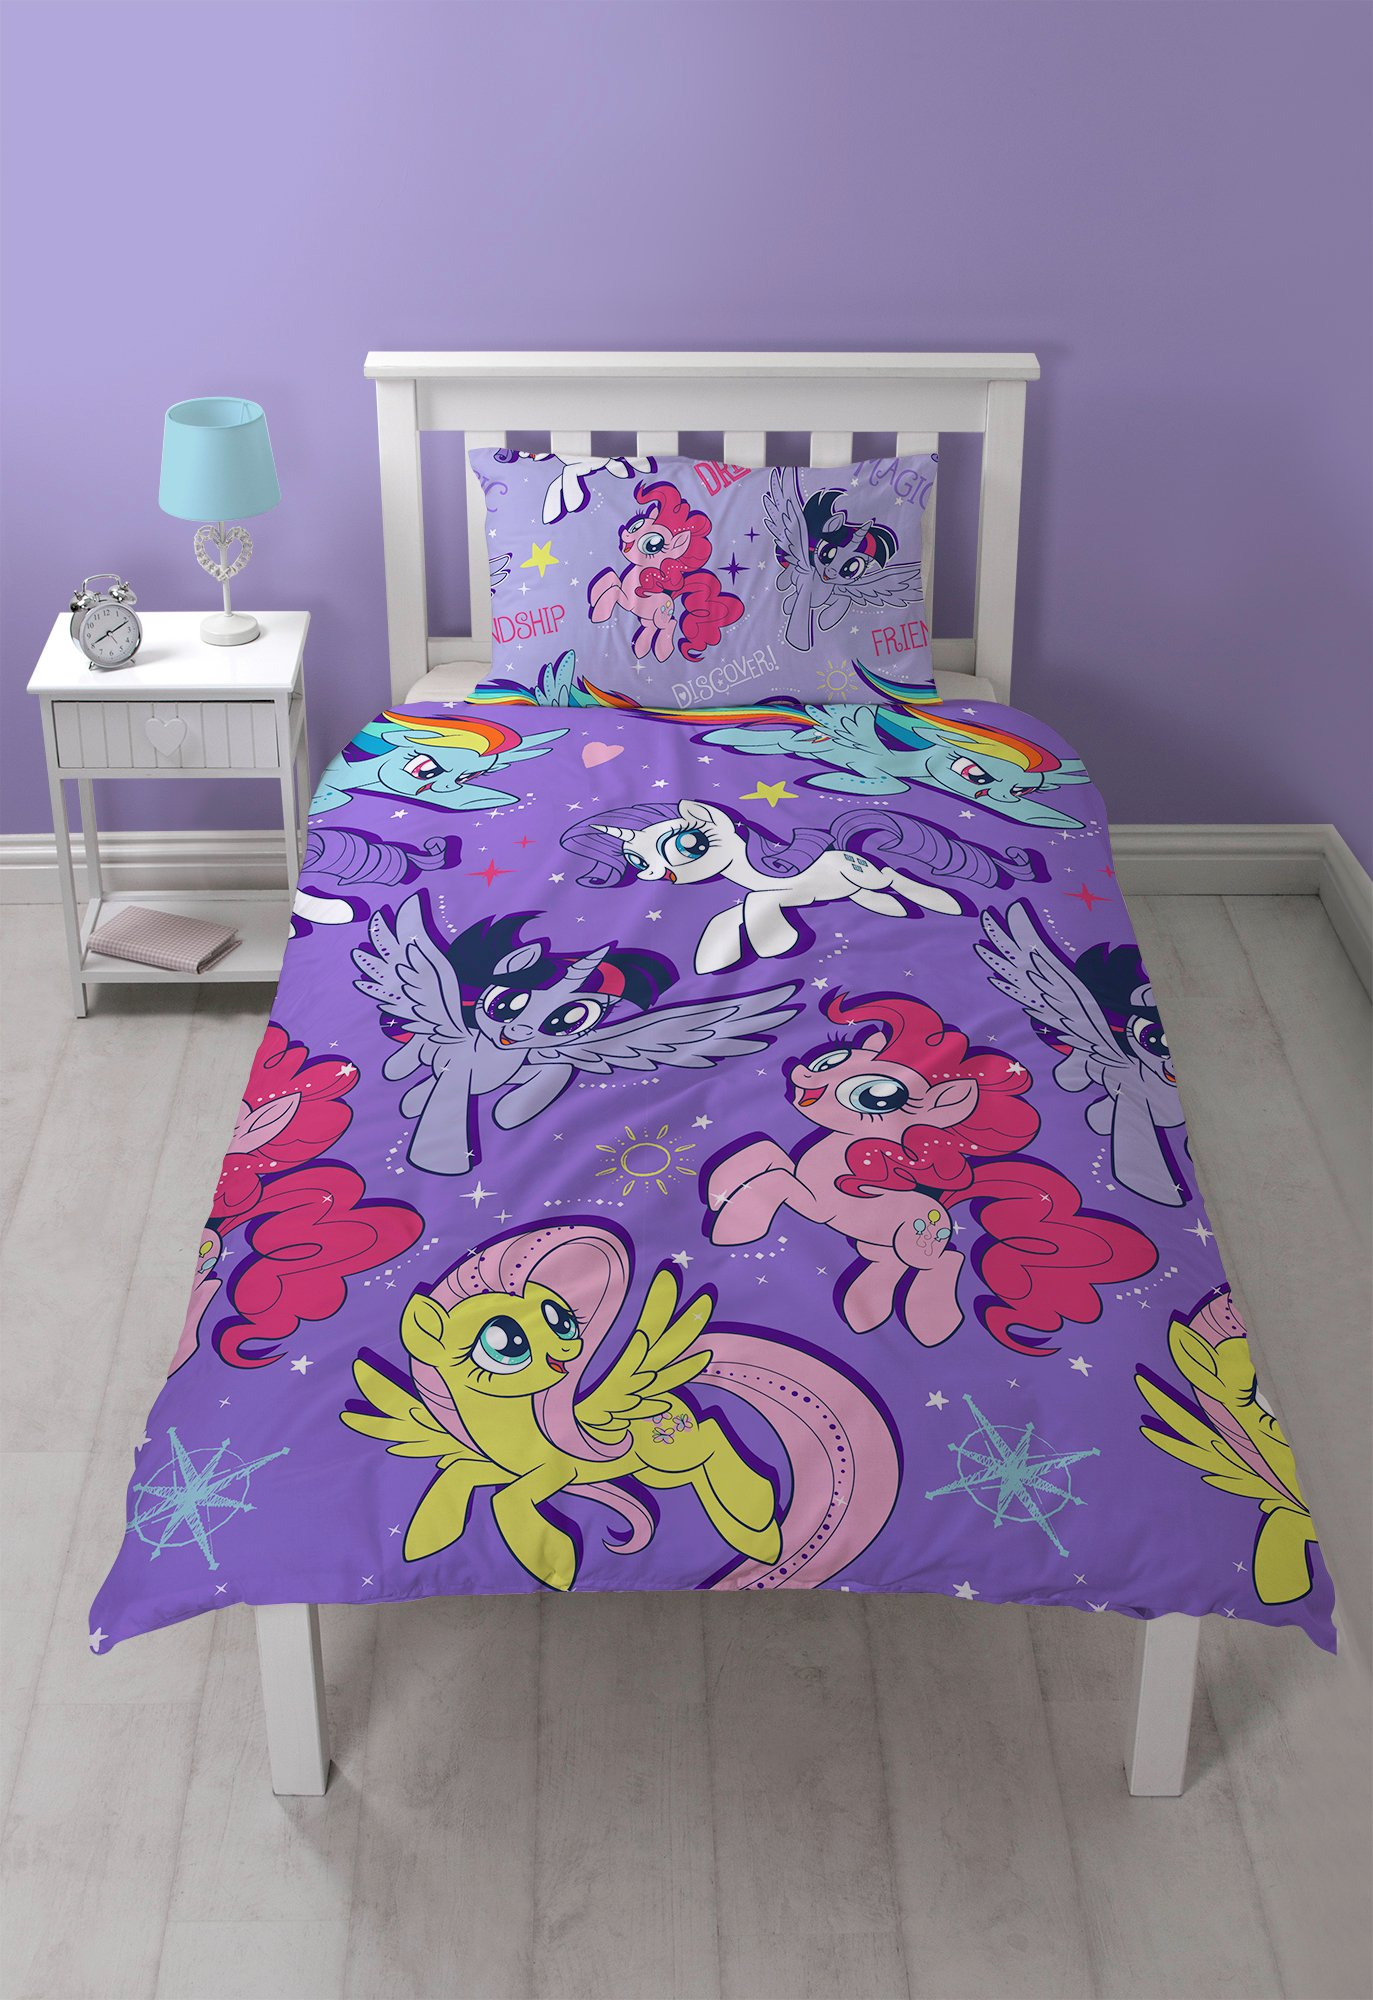 My Little Pony Adventure Bedding Set - Single.